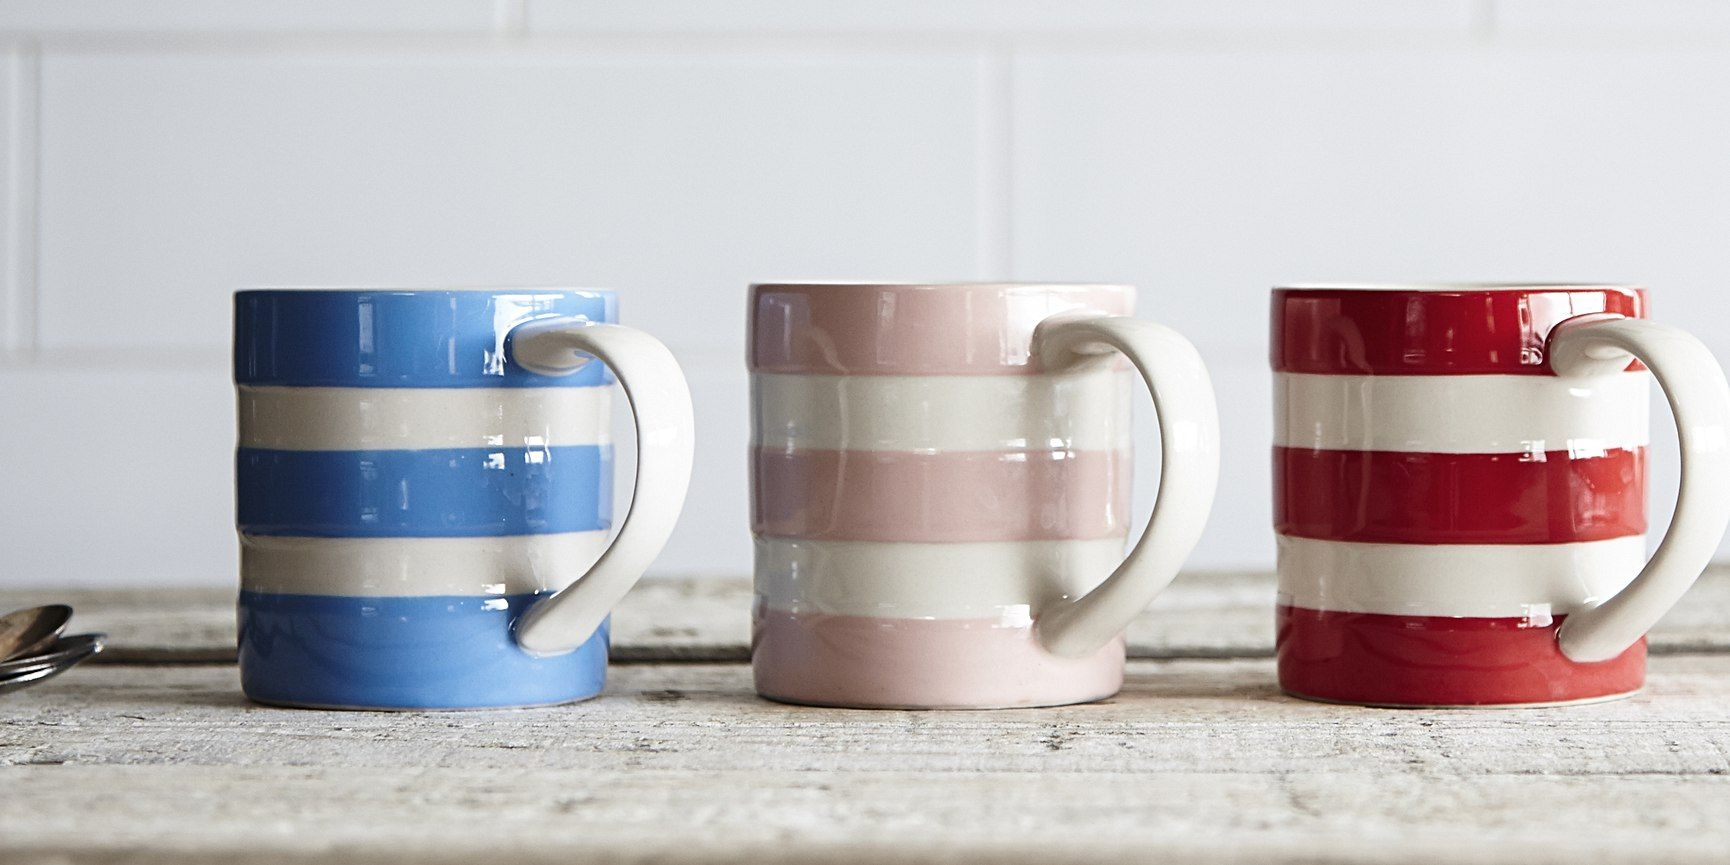 Mugs Cornishware Classic British Kitchenware By T G Green Mugs Cornishware Kitchenware